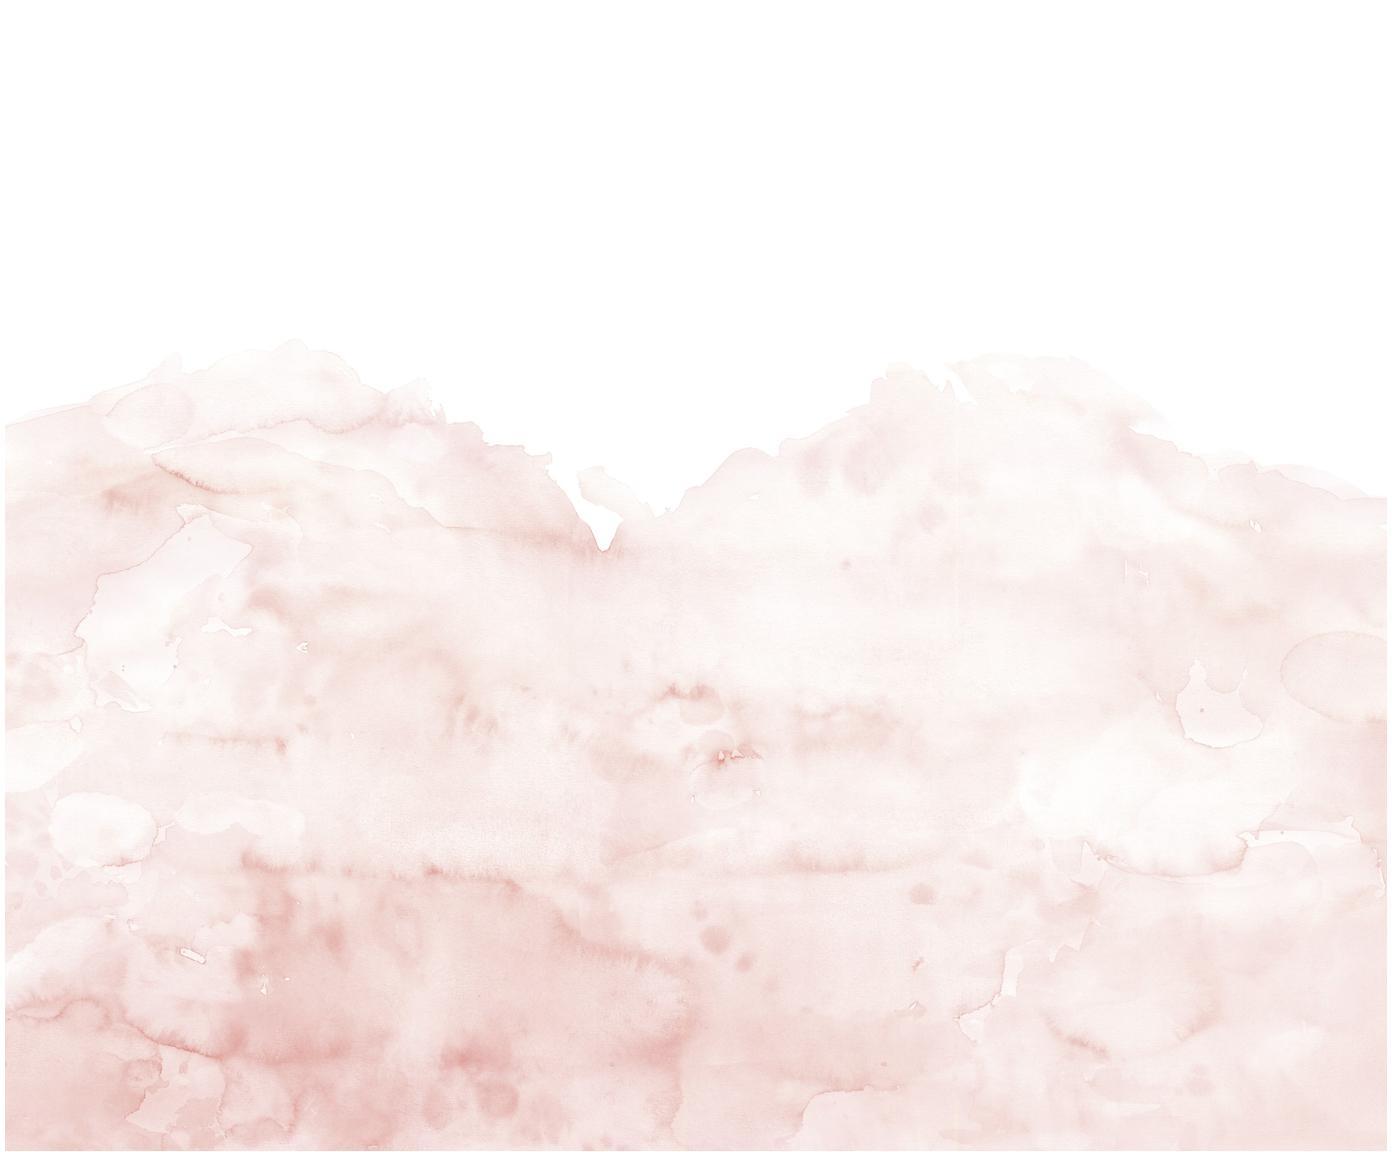 Fototapete Pink Clouds, Vlies, Rosa, Weiss, 372 x 280 cm